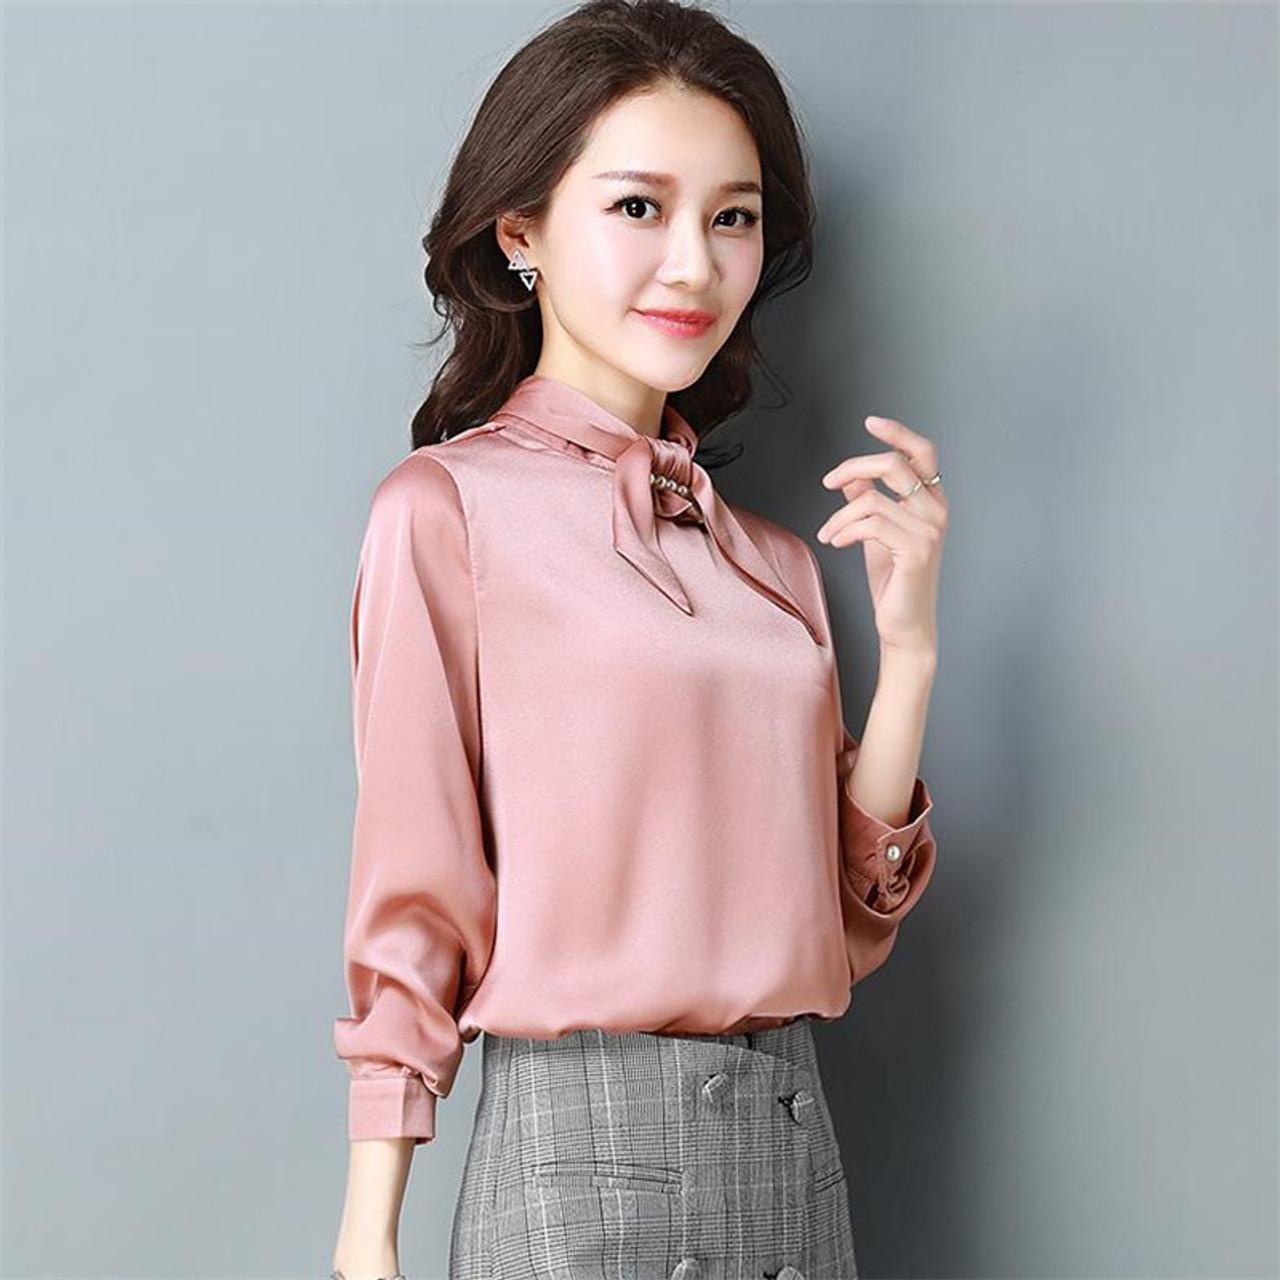 044c3d74cfc874 ... High Quality Tops 2018 New Women Silk Satin Blouses Female Long Sleeve  Shirts Office Lady Elegant ...